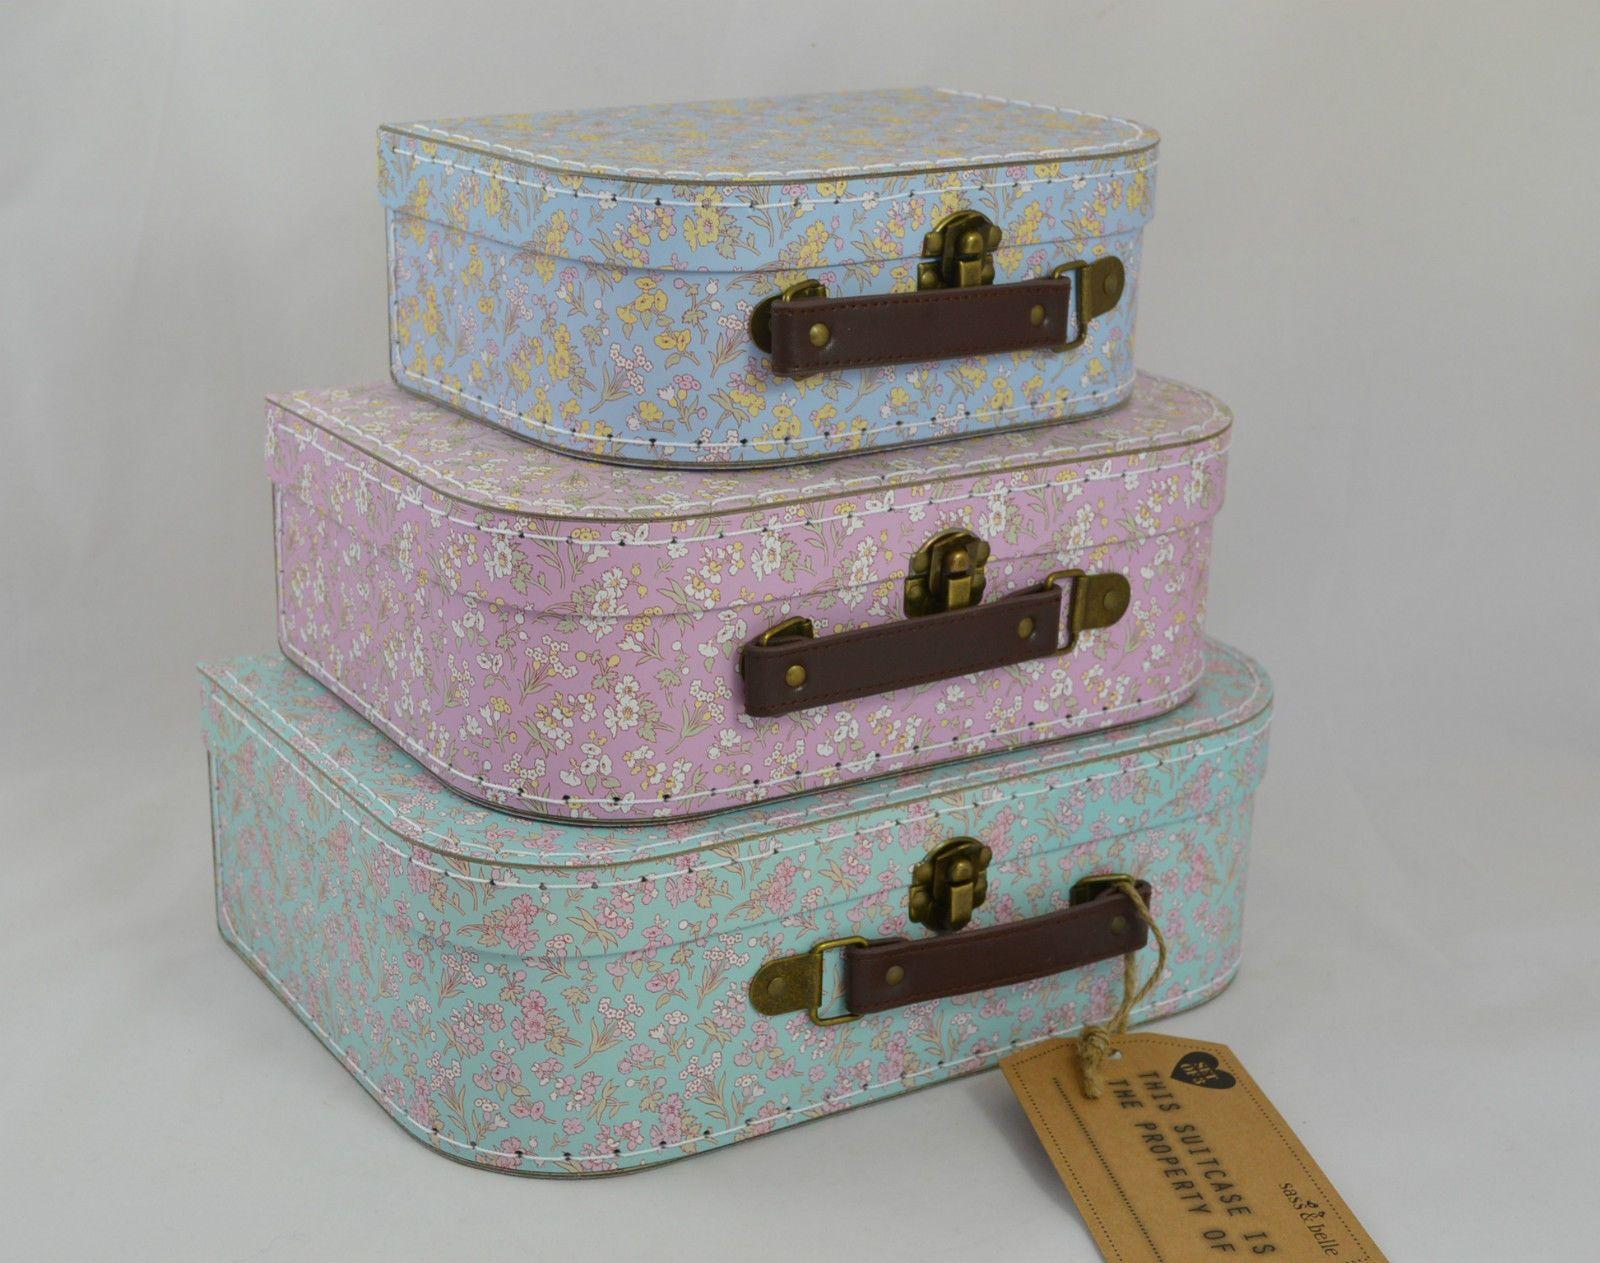 MAKE UP STORAGE ---- Sass & Belle Grace Vintage Floral Suitcases Decorative Storage 3 sizes or set in   eBay